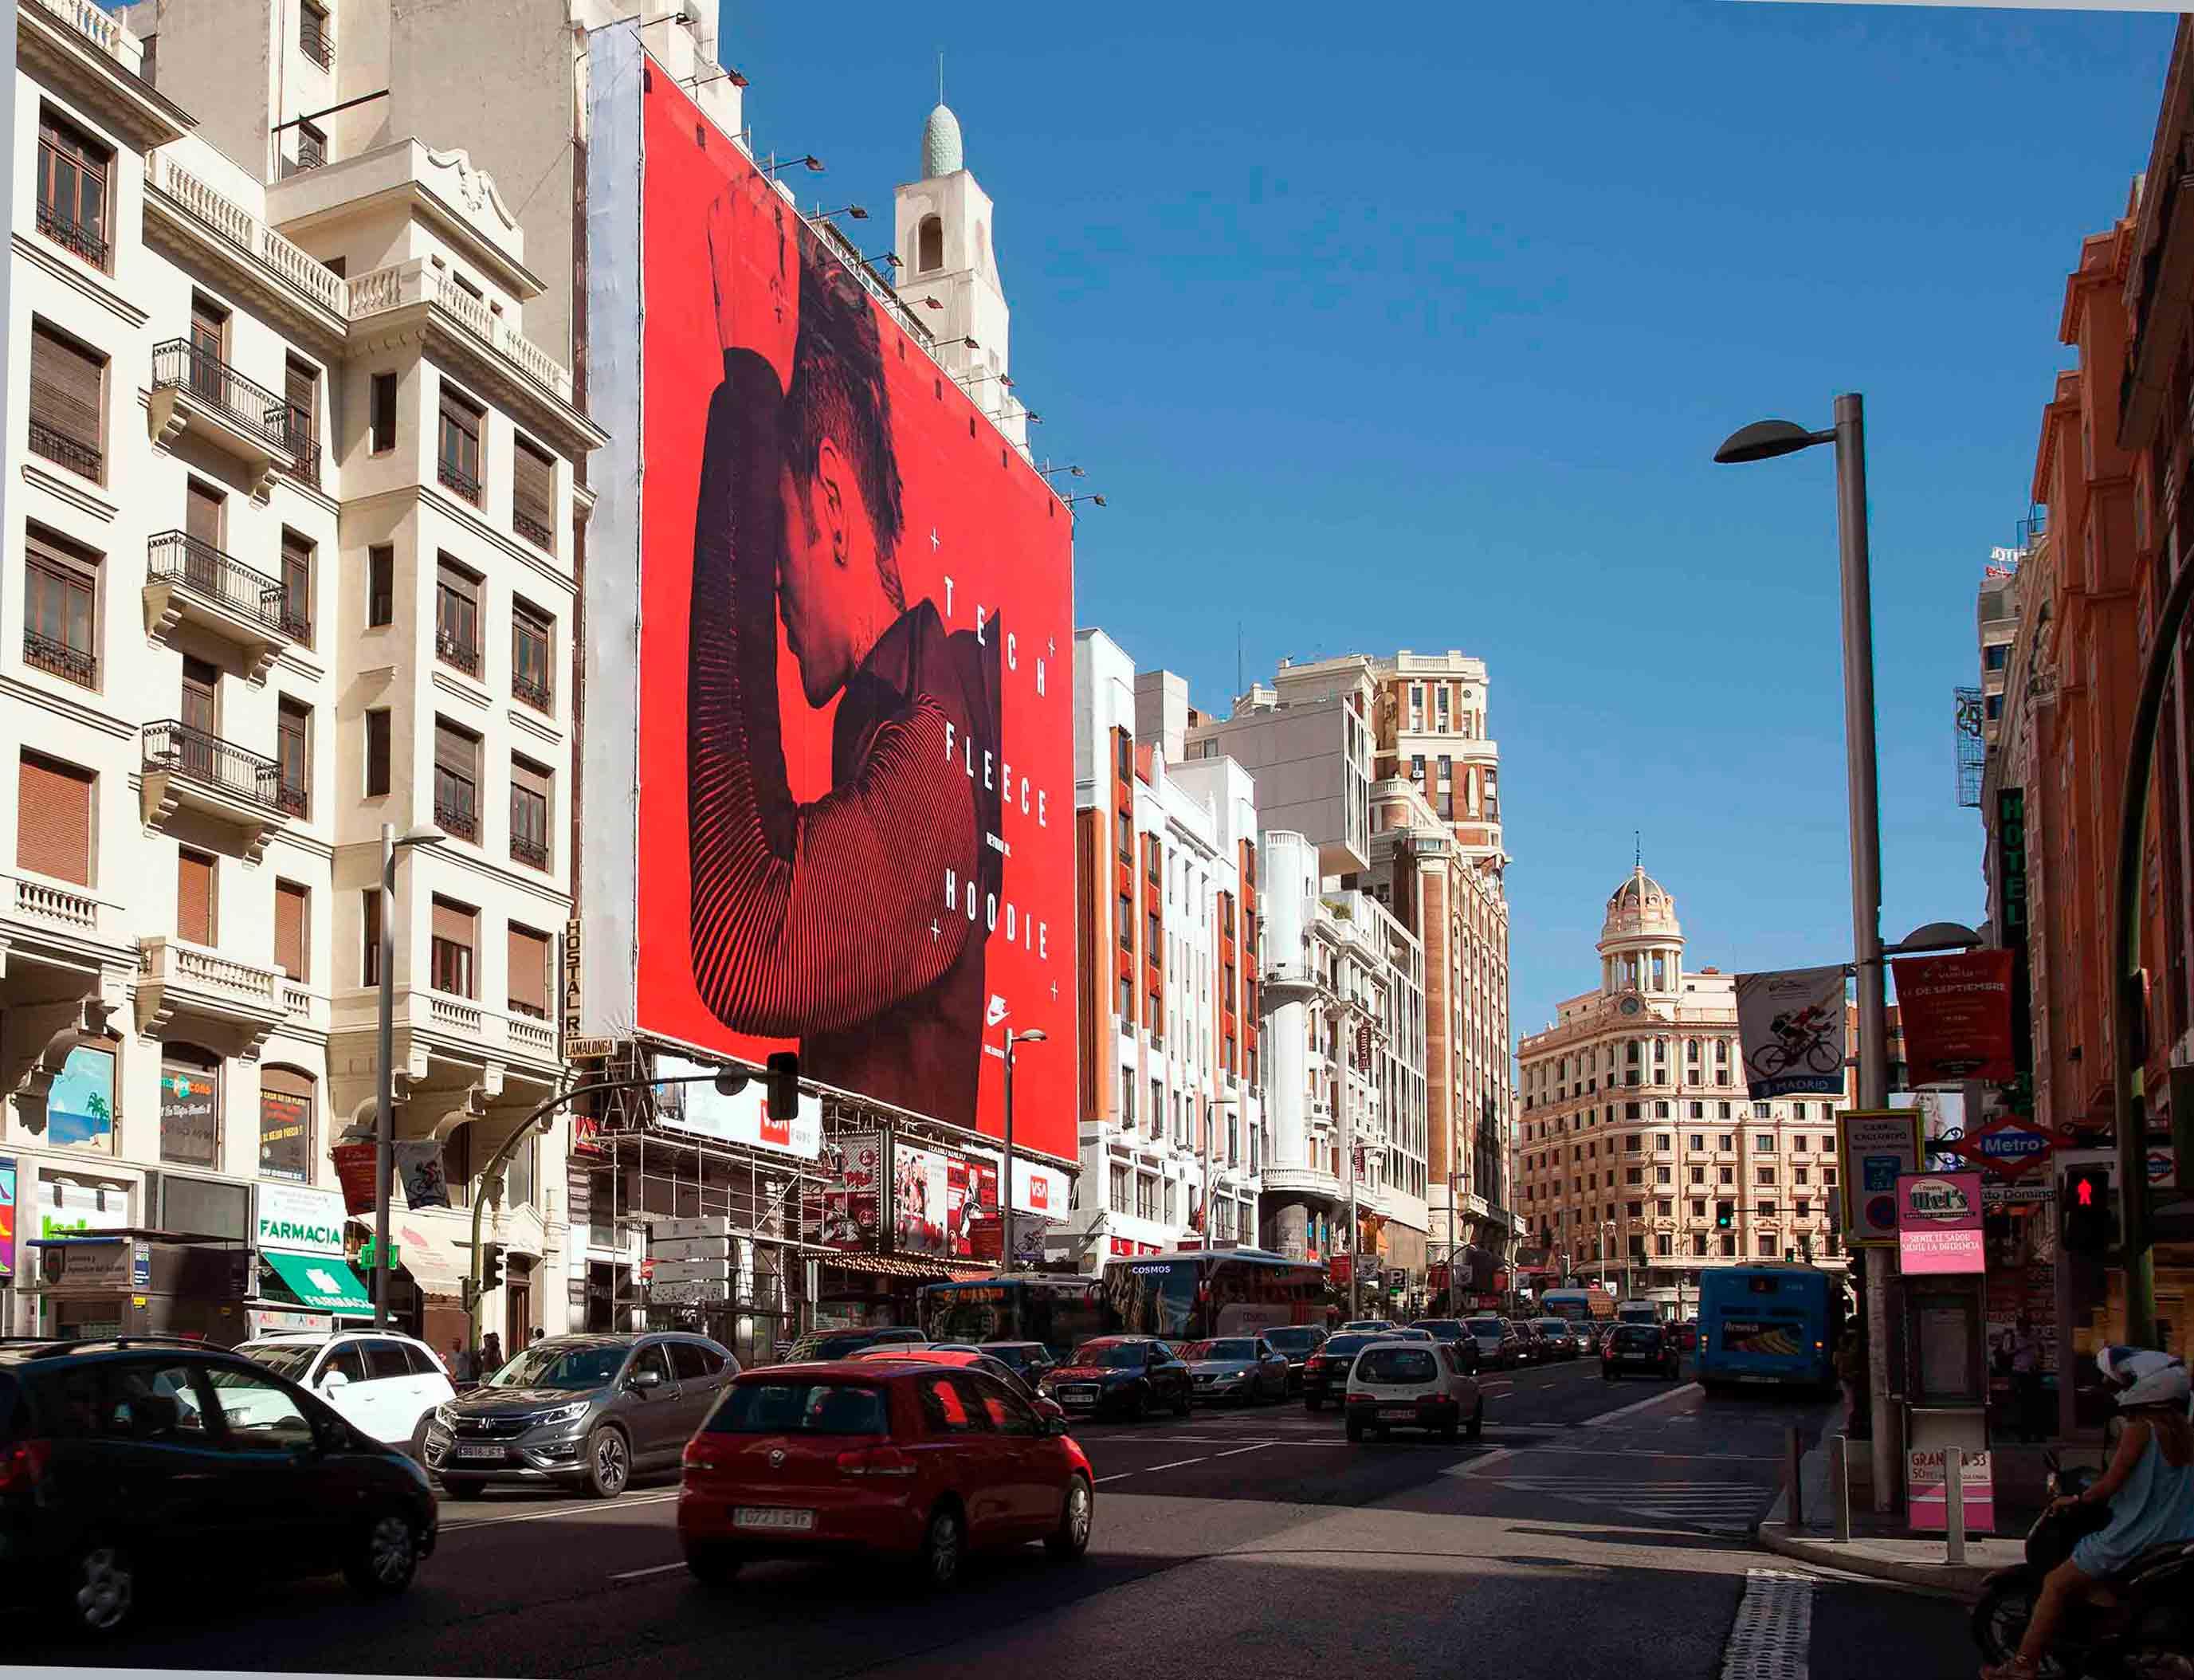 lona-publicitaria-madrid-gran-via-54-nike-tech-fleece-vsa-comunicacion